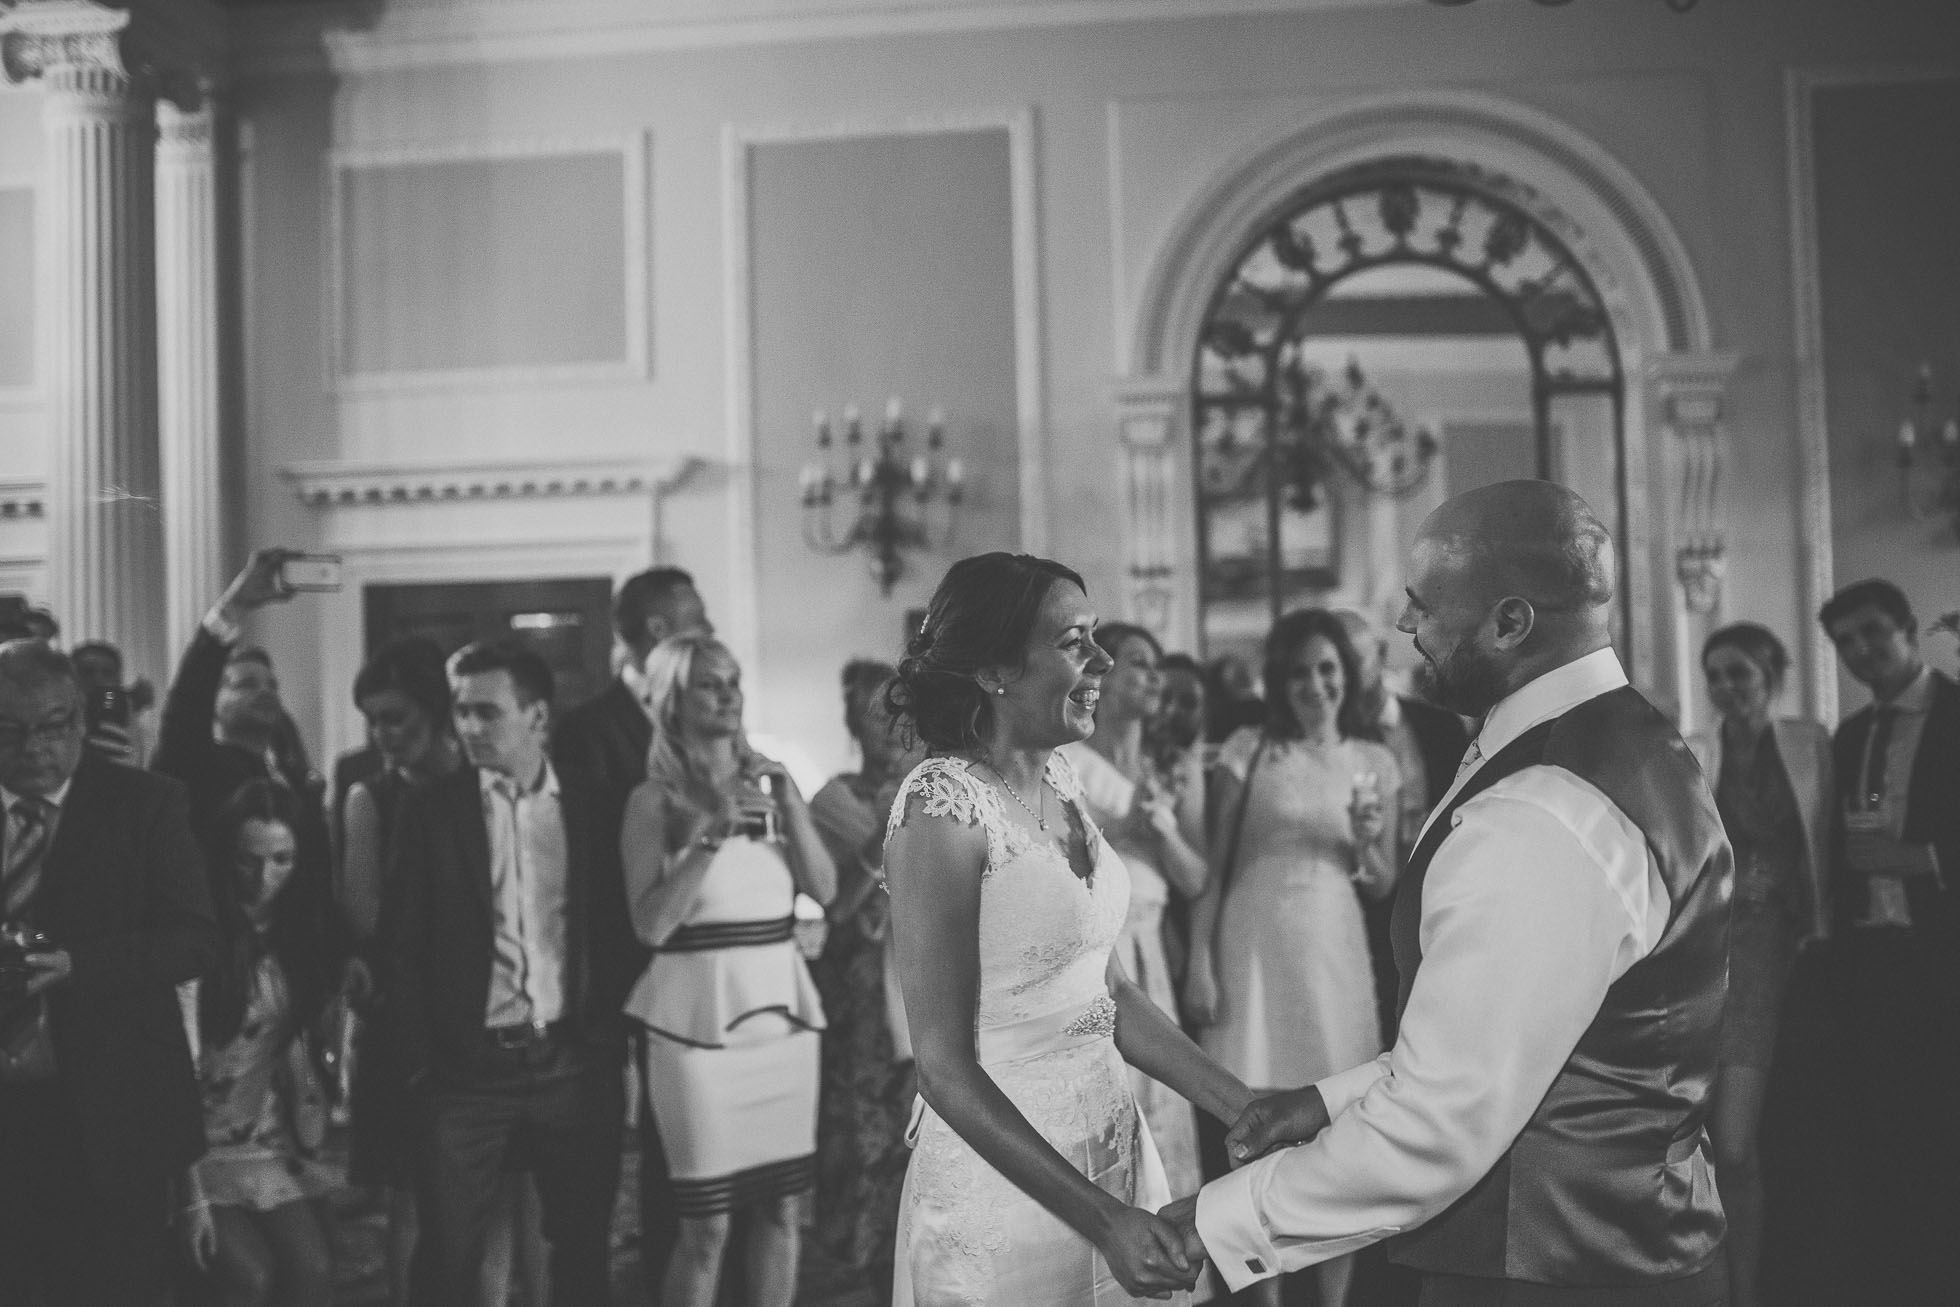 denton-hall-wedding-photographer-65.jpg